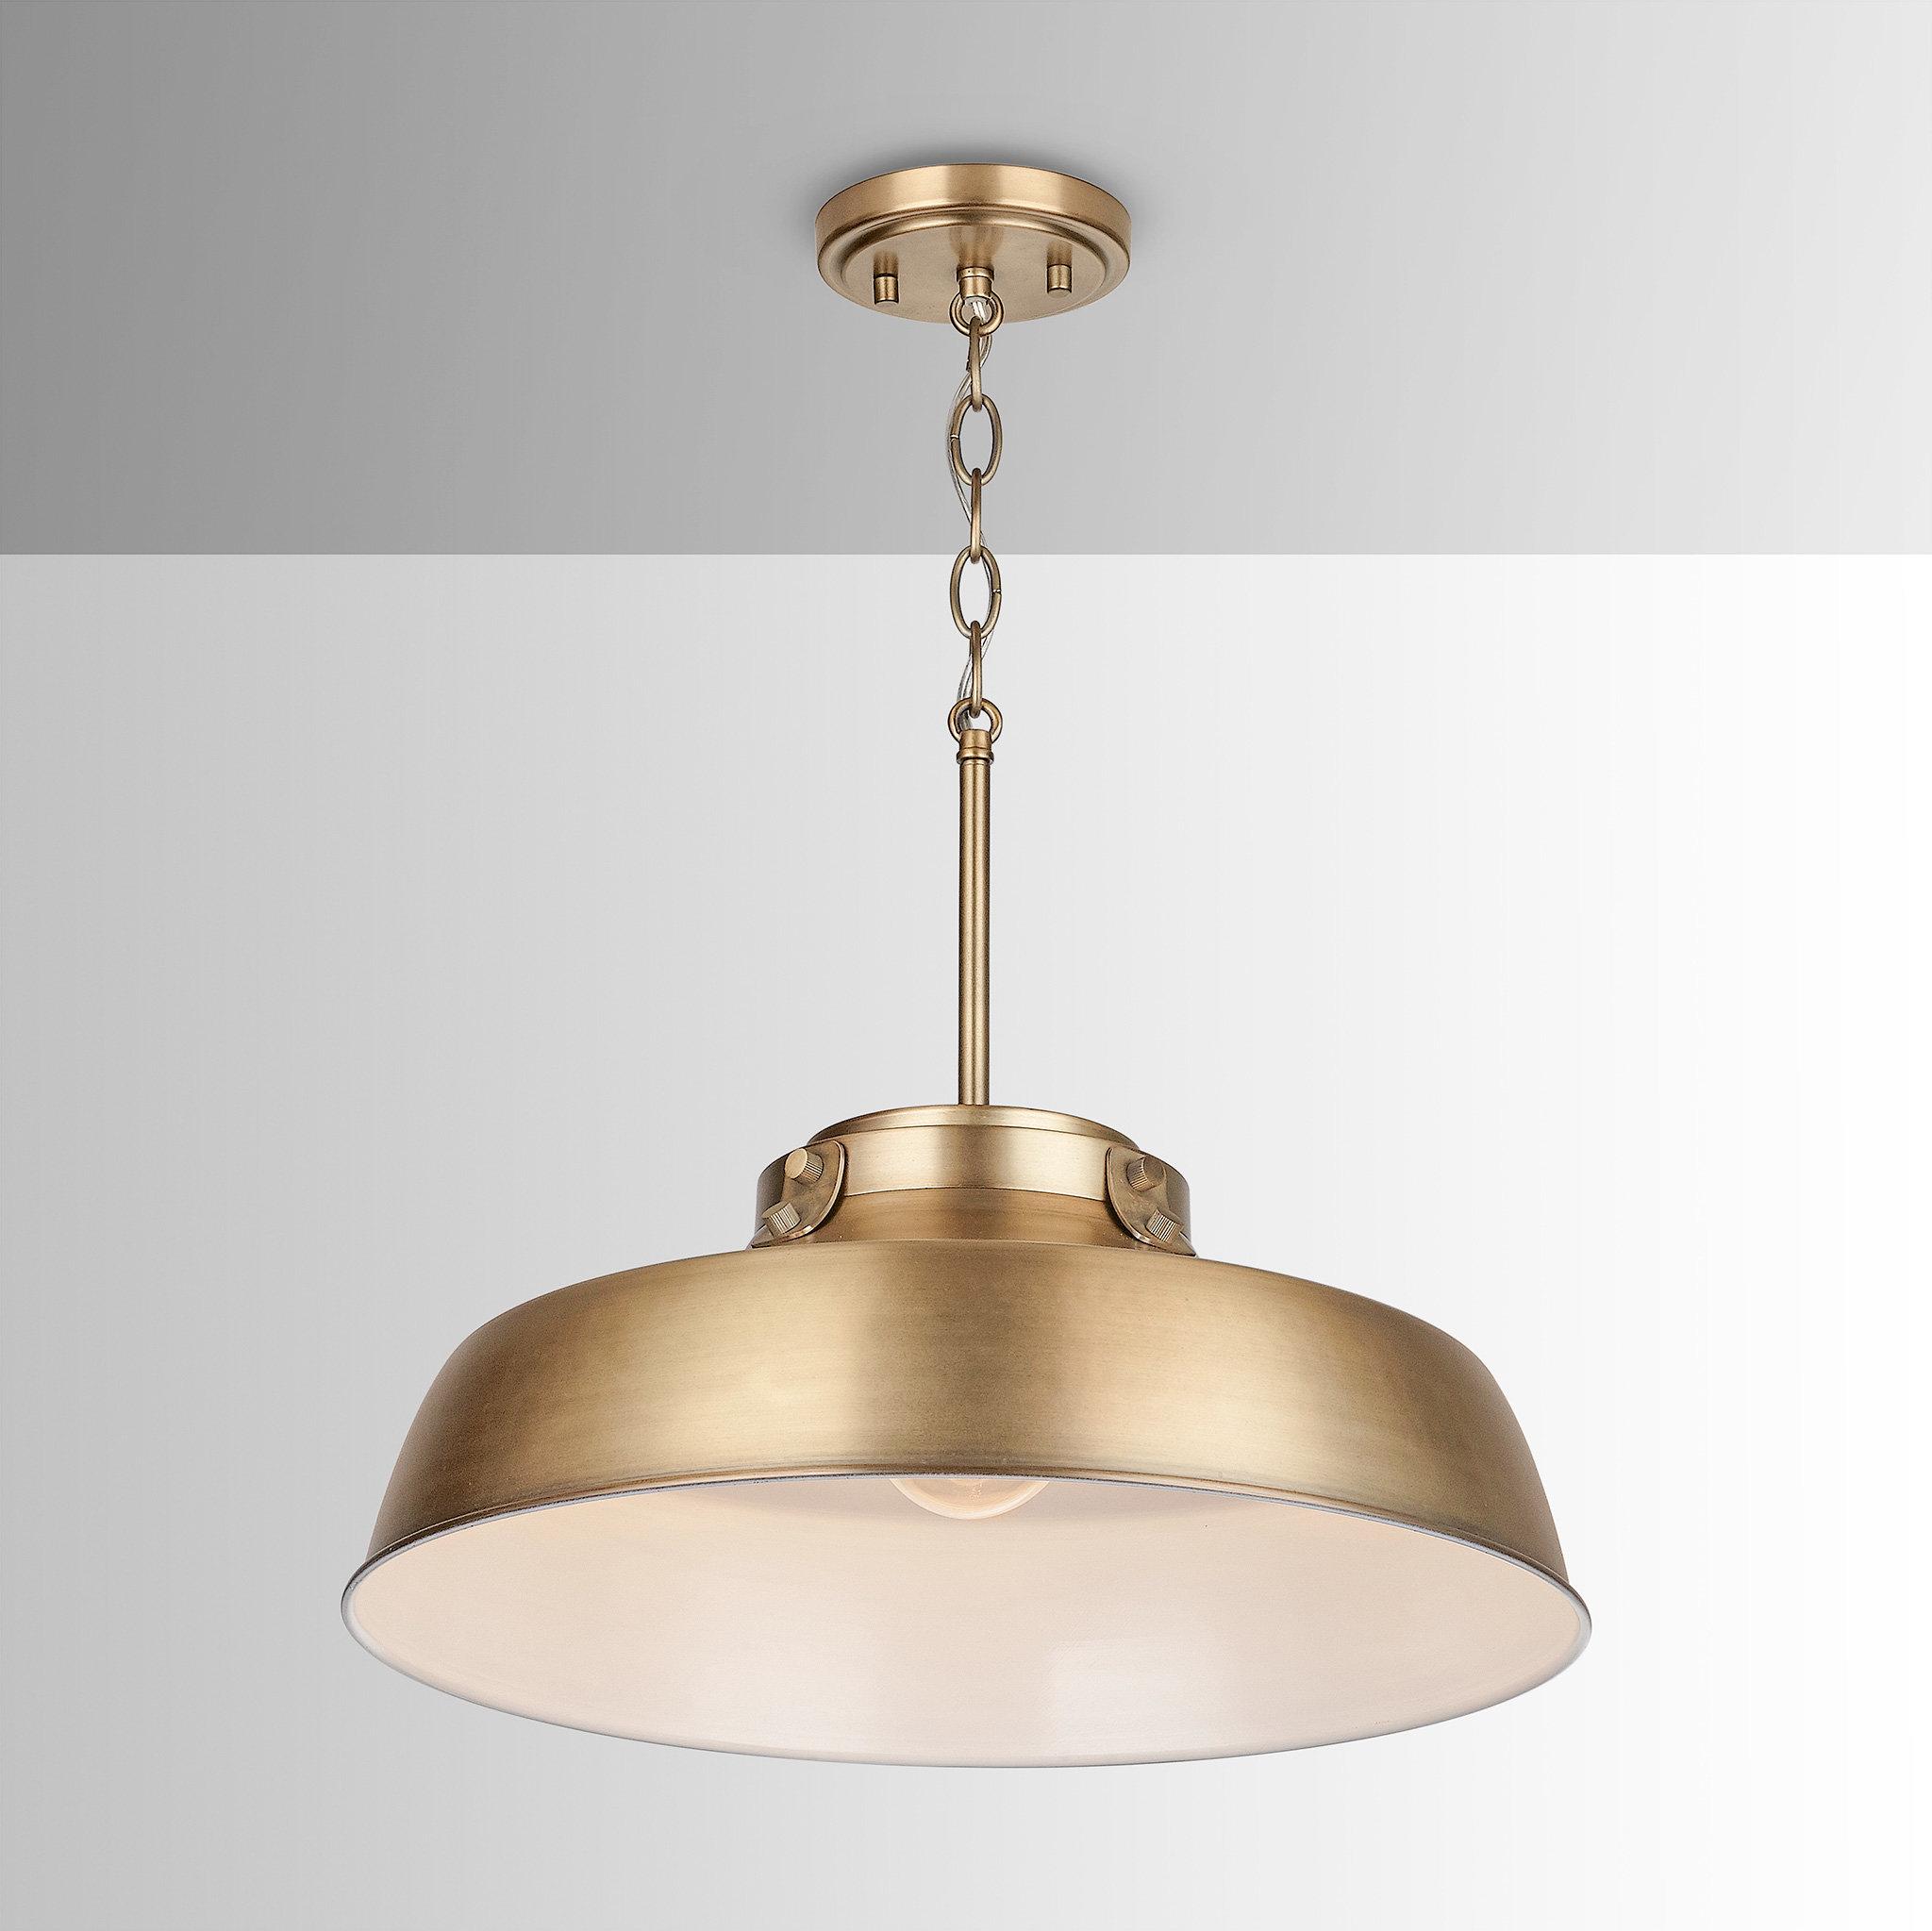 1 Light Dome Pendant Regarding Mueller 1 Light Single Dome Pendants (Photo 27 of 30)